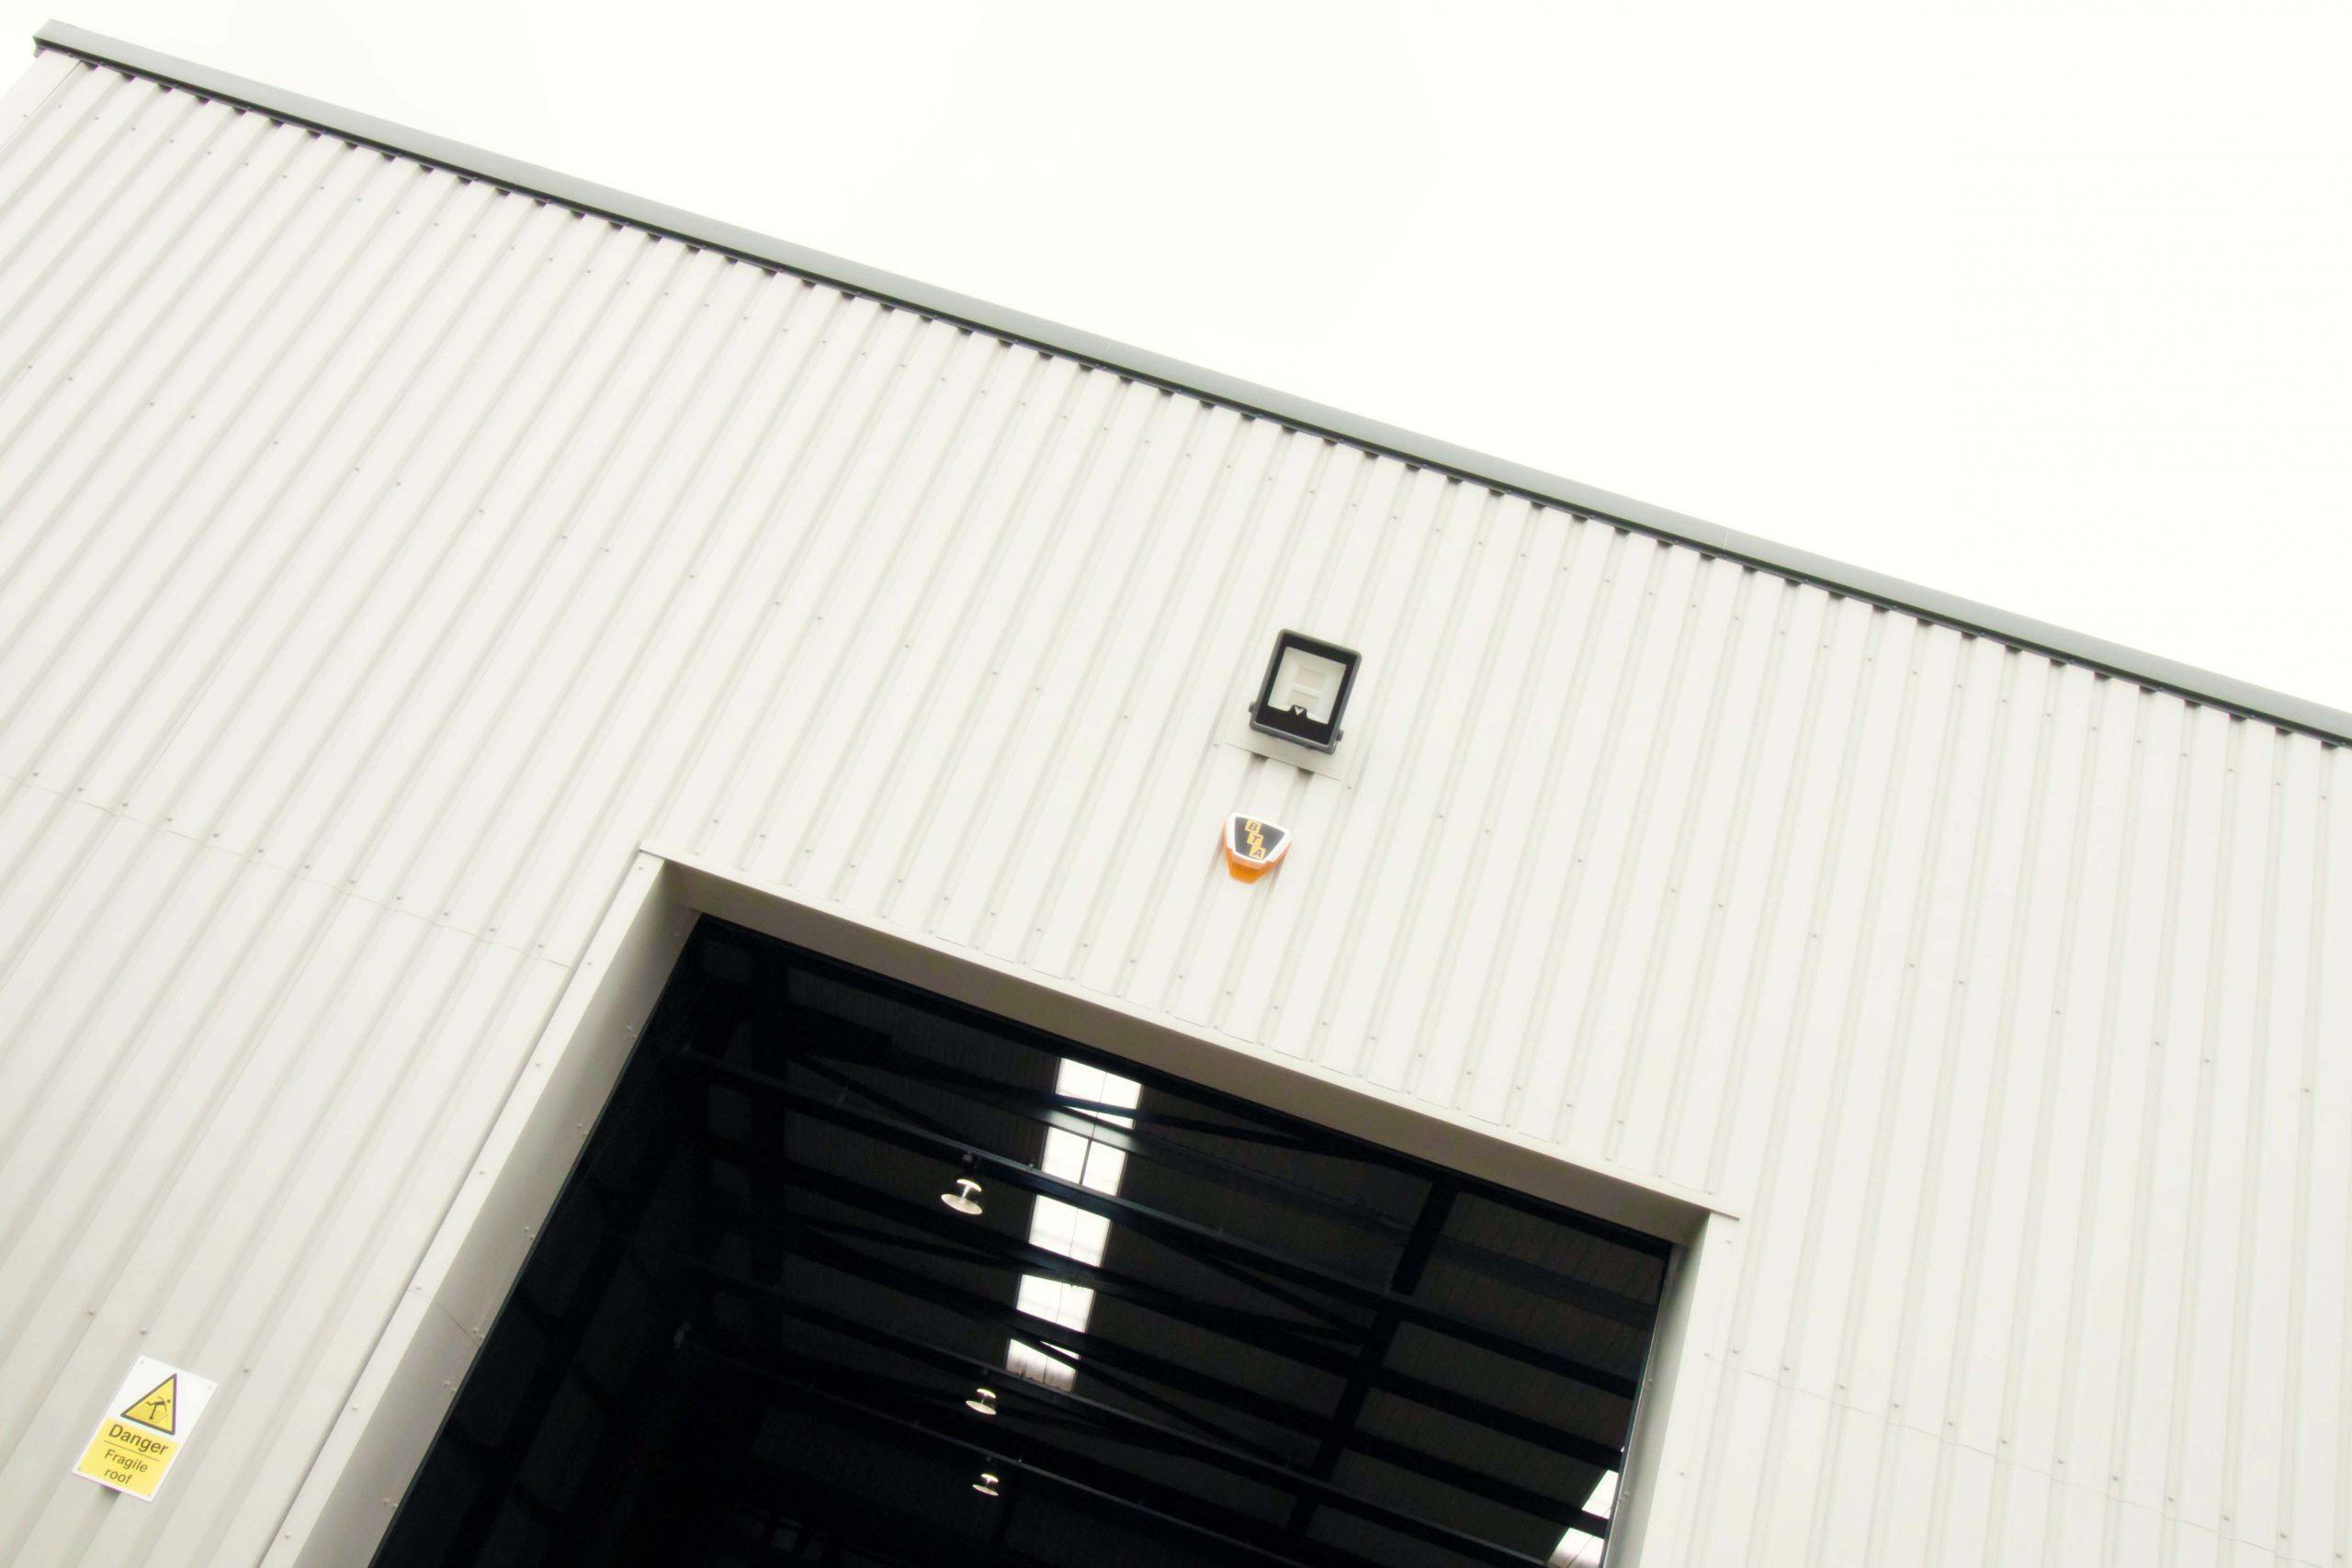 Commercial Intruder Alarm